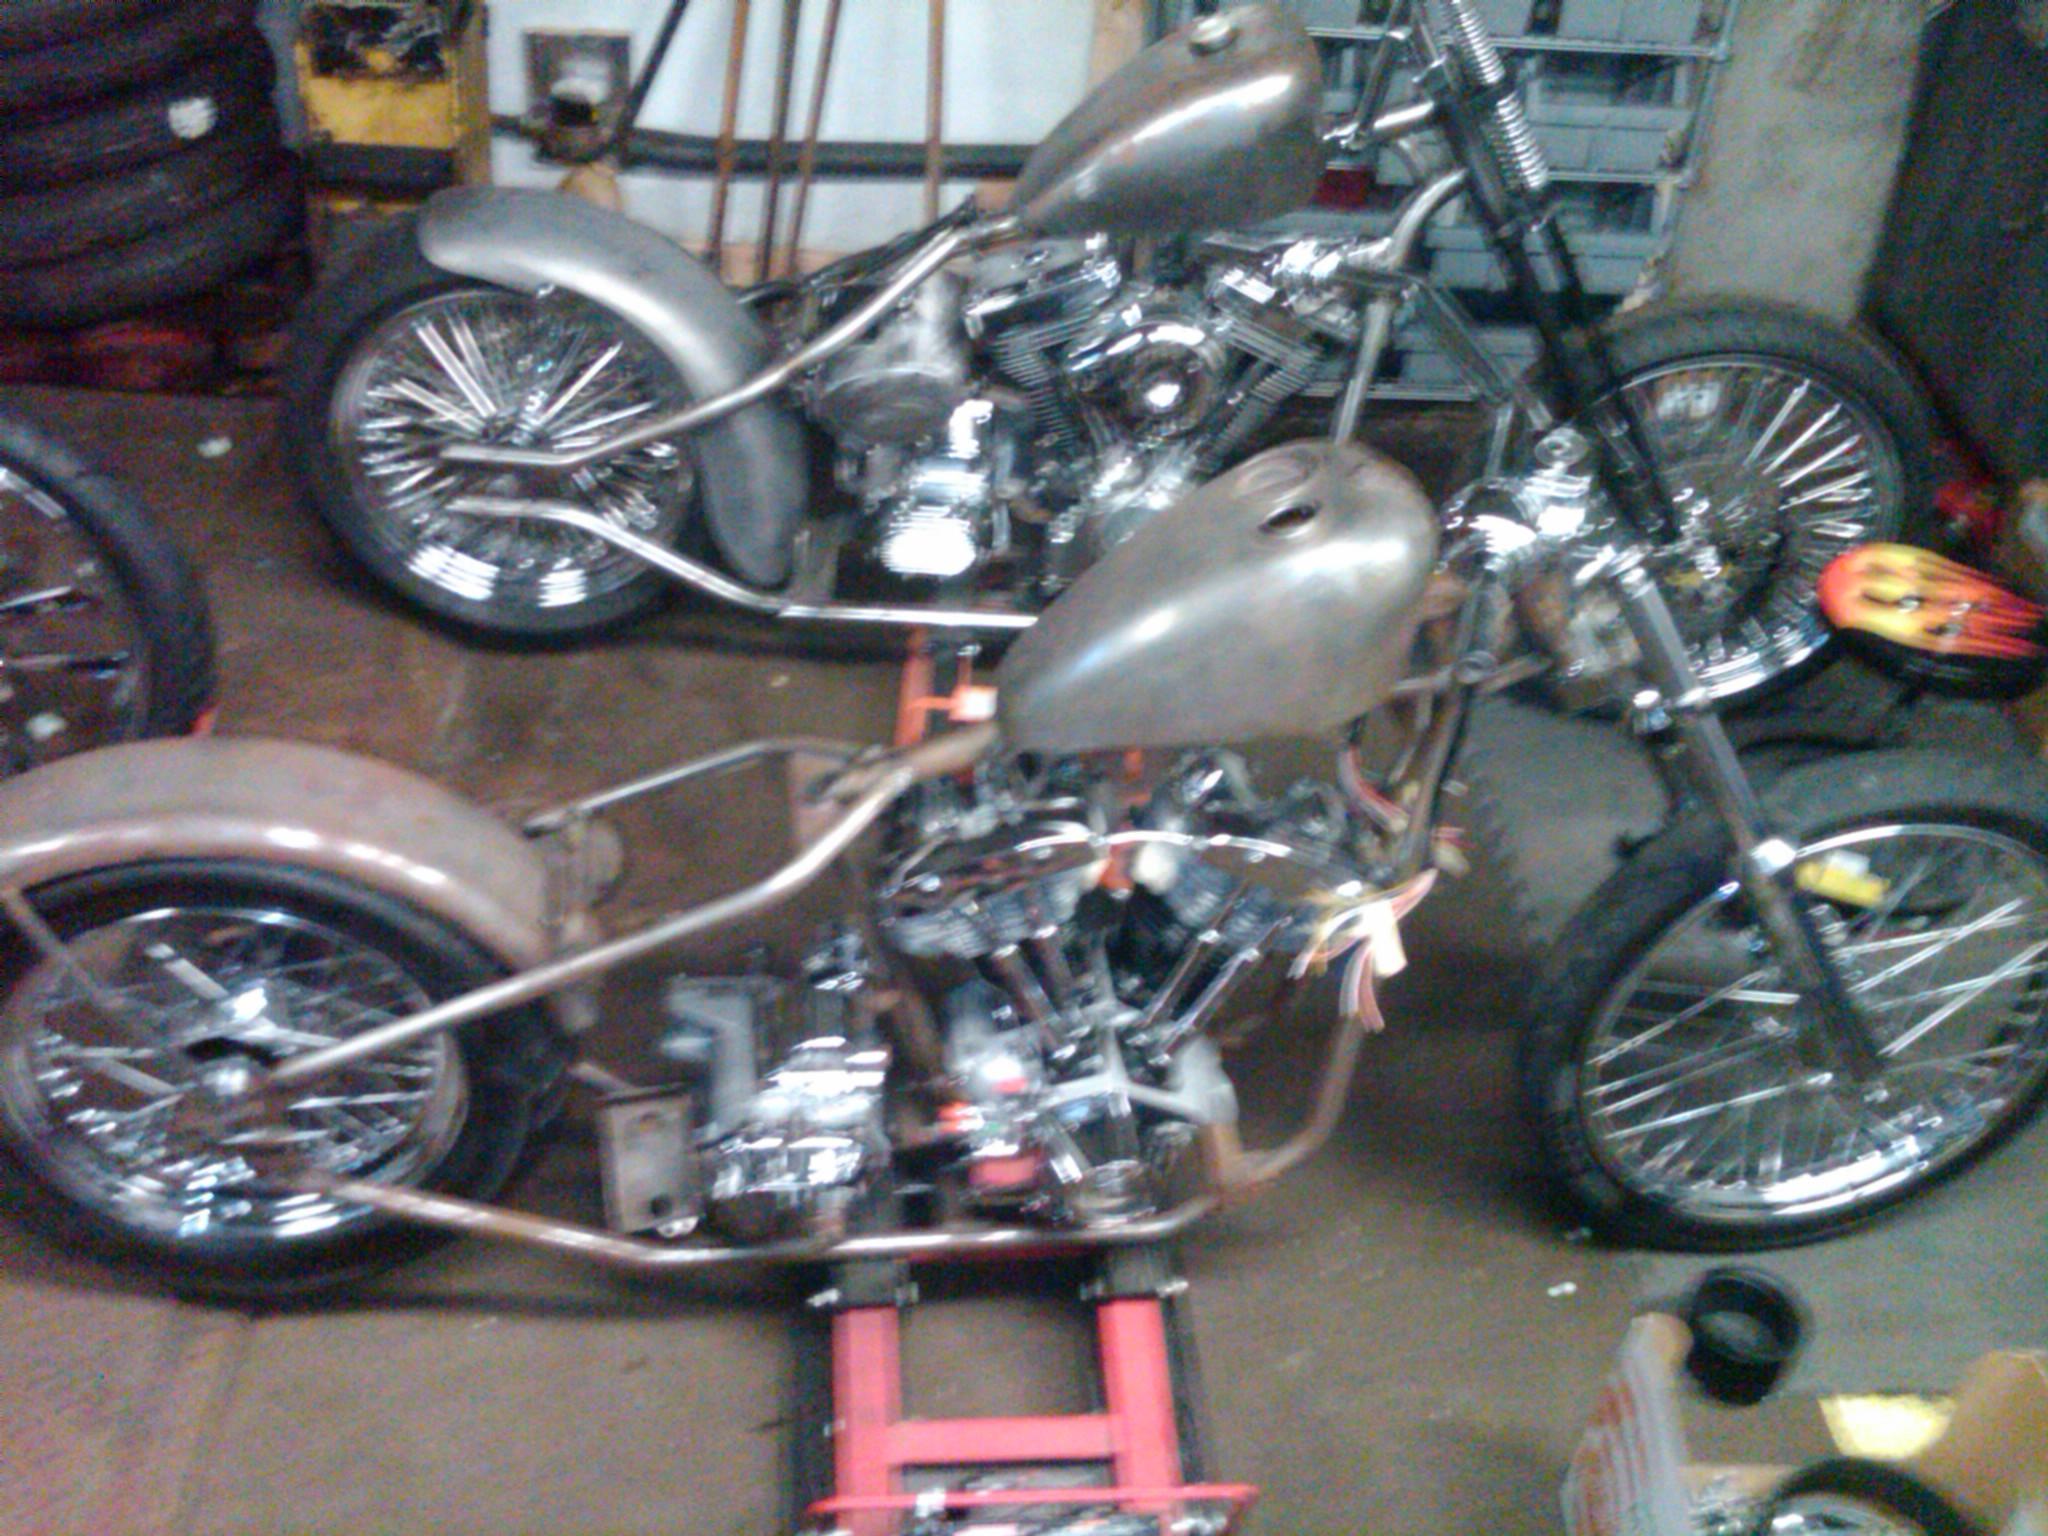 1958 Harley Davidson Hummer Gas Tank